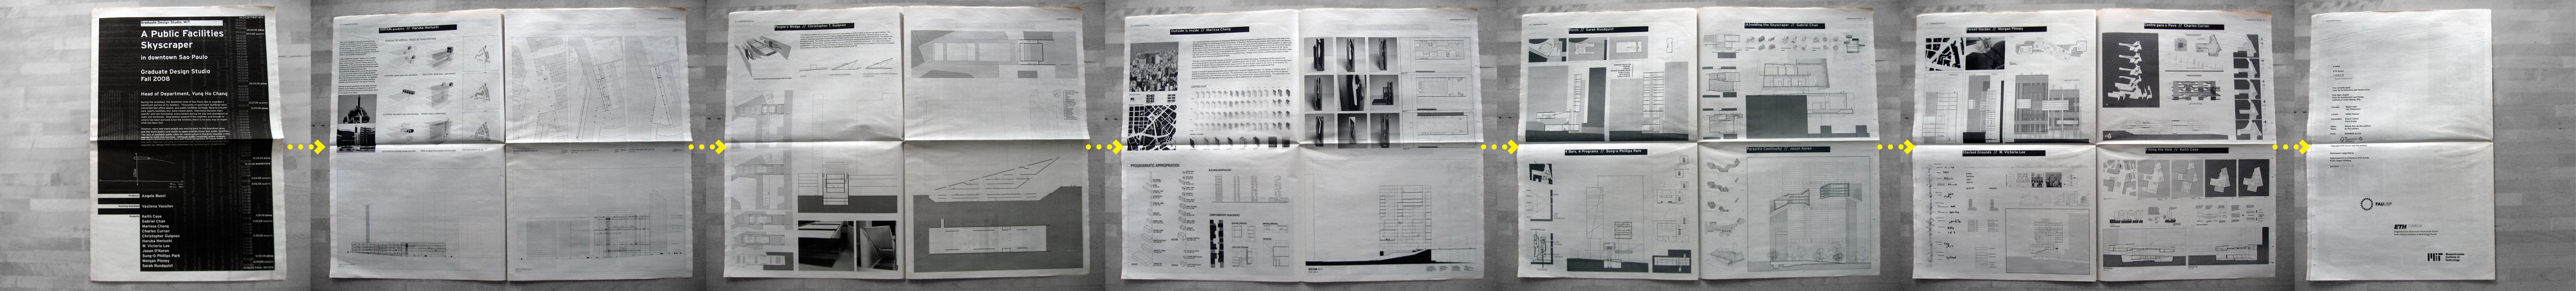 http://harukahoriuchi.com/files/gimgs/5_publication-filmstriped.jpg